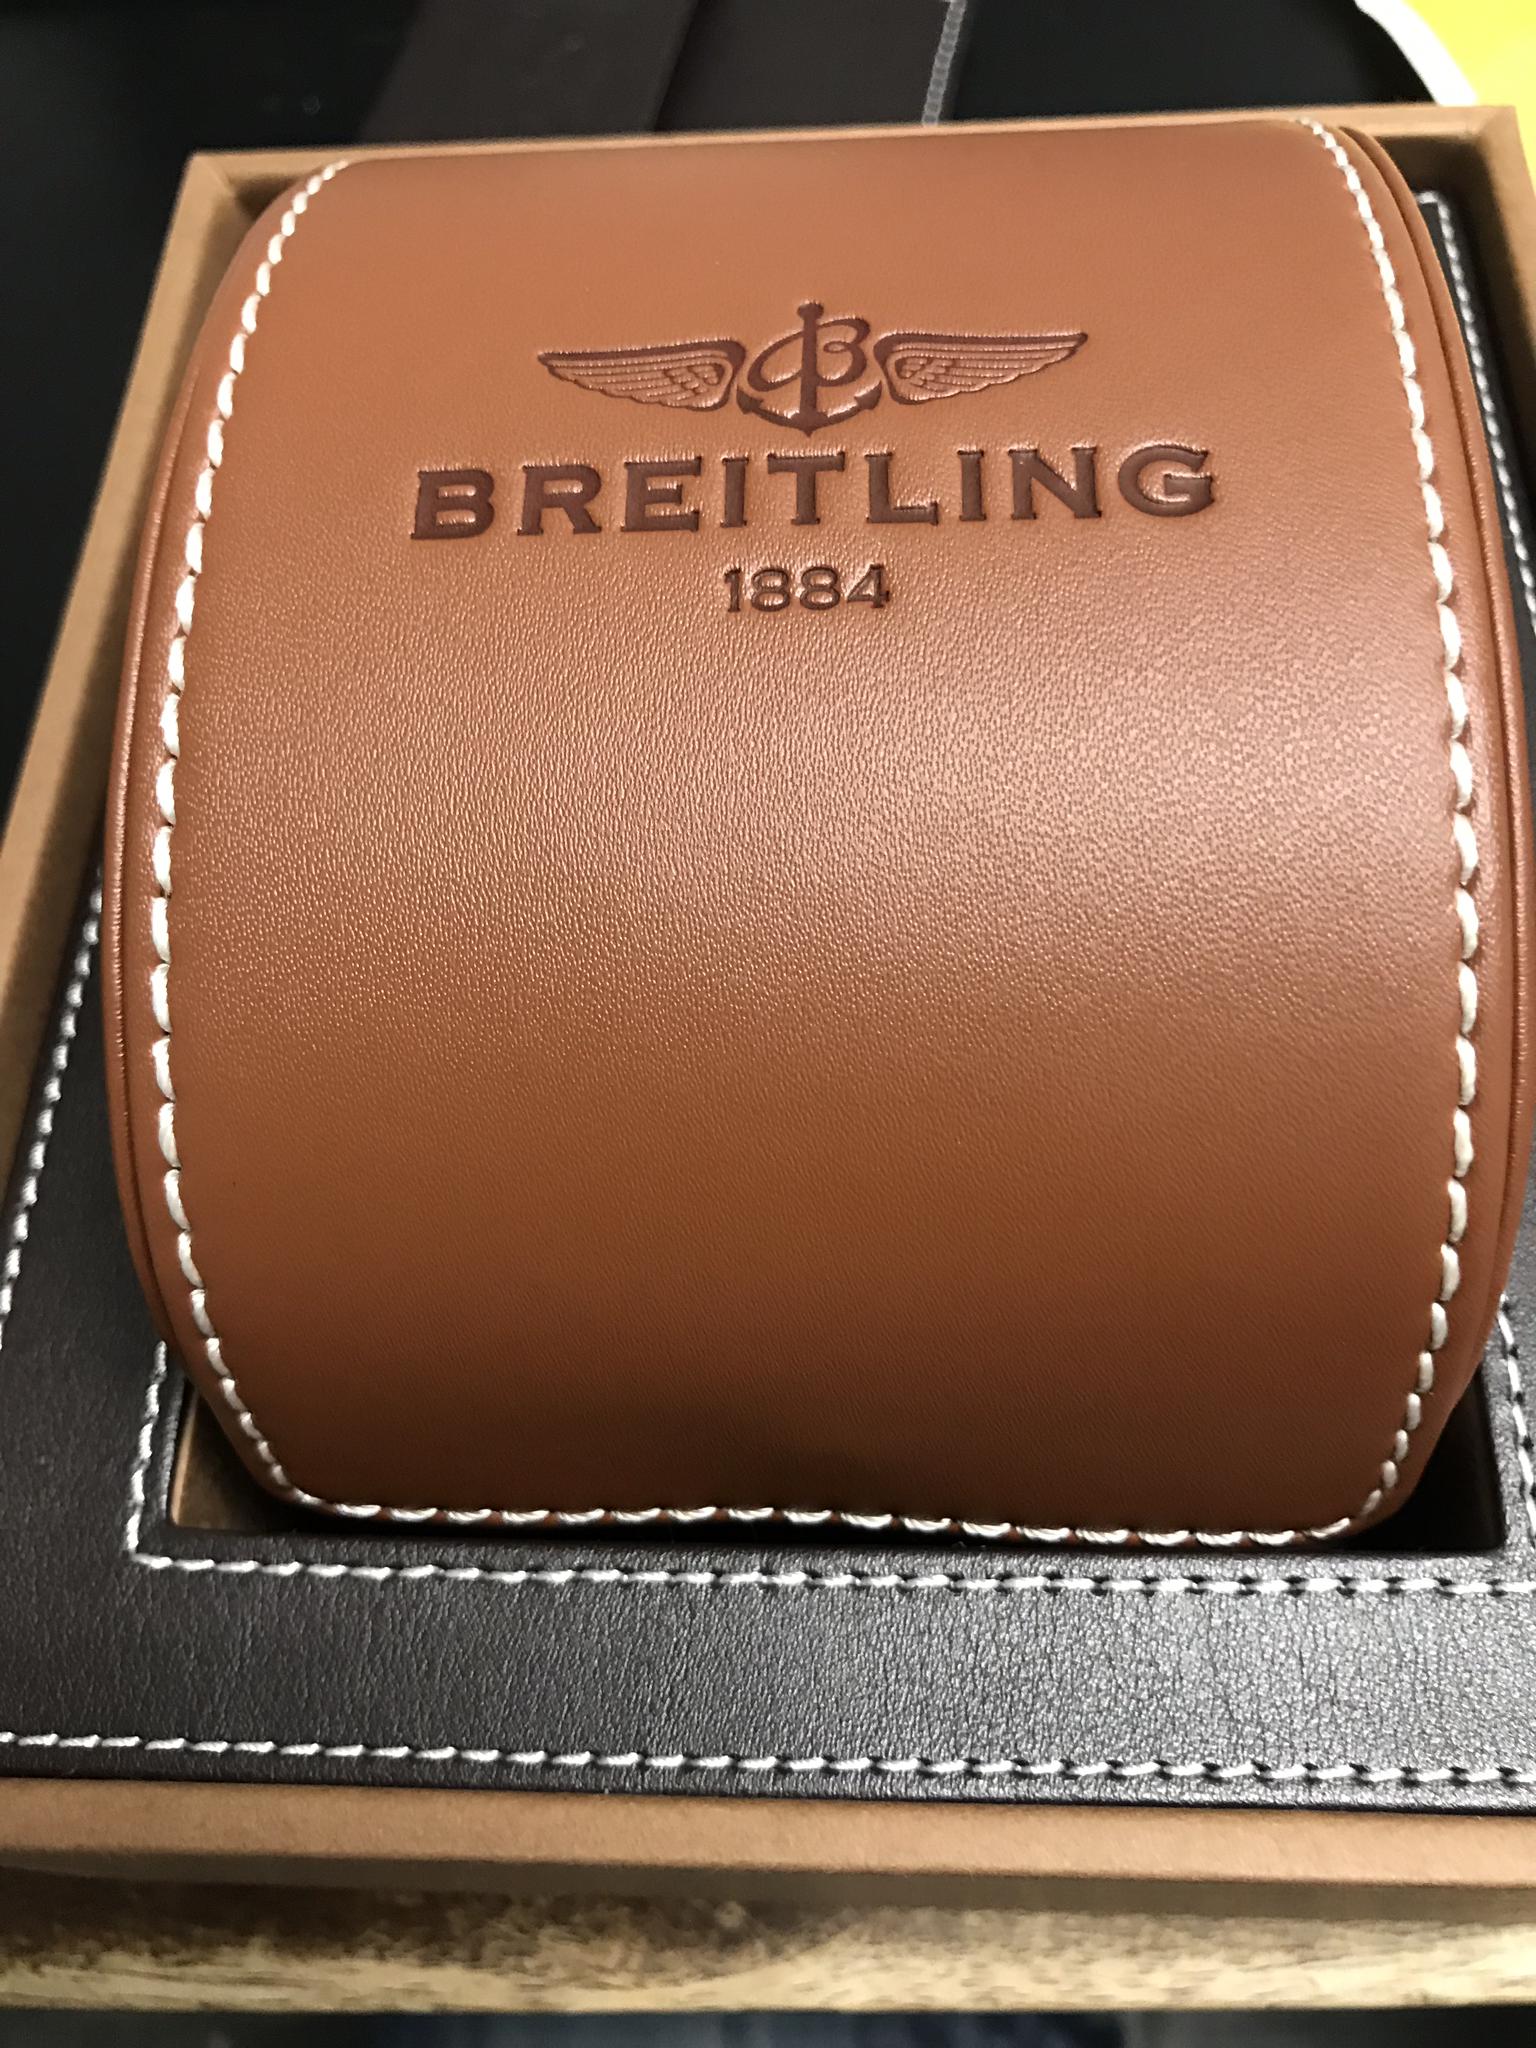 Breitling Avenger II Automatic Chronograph